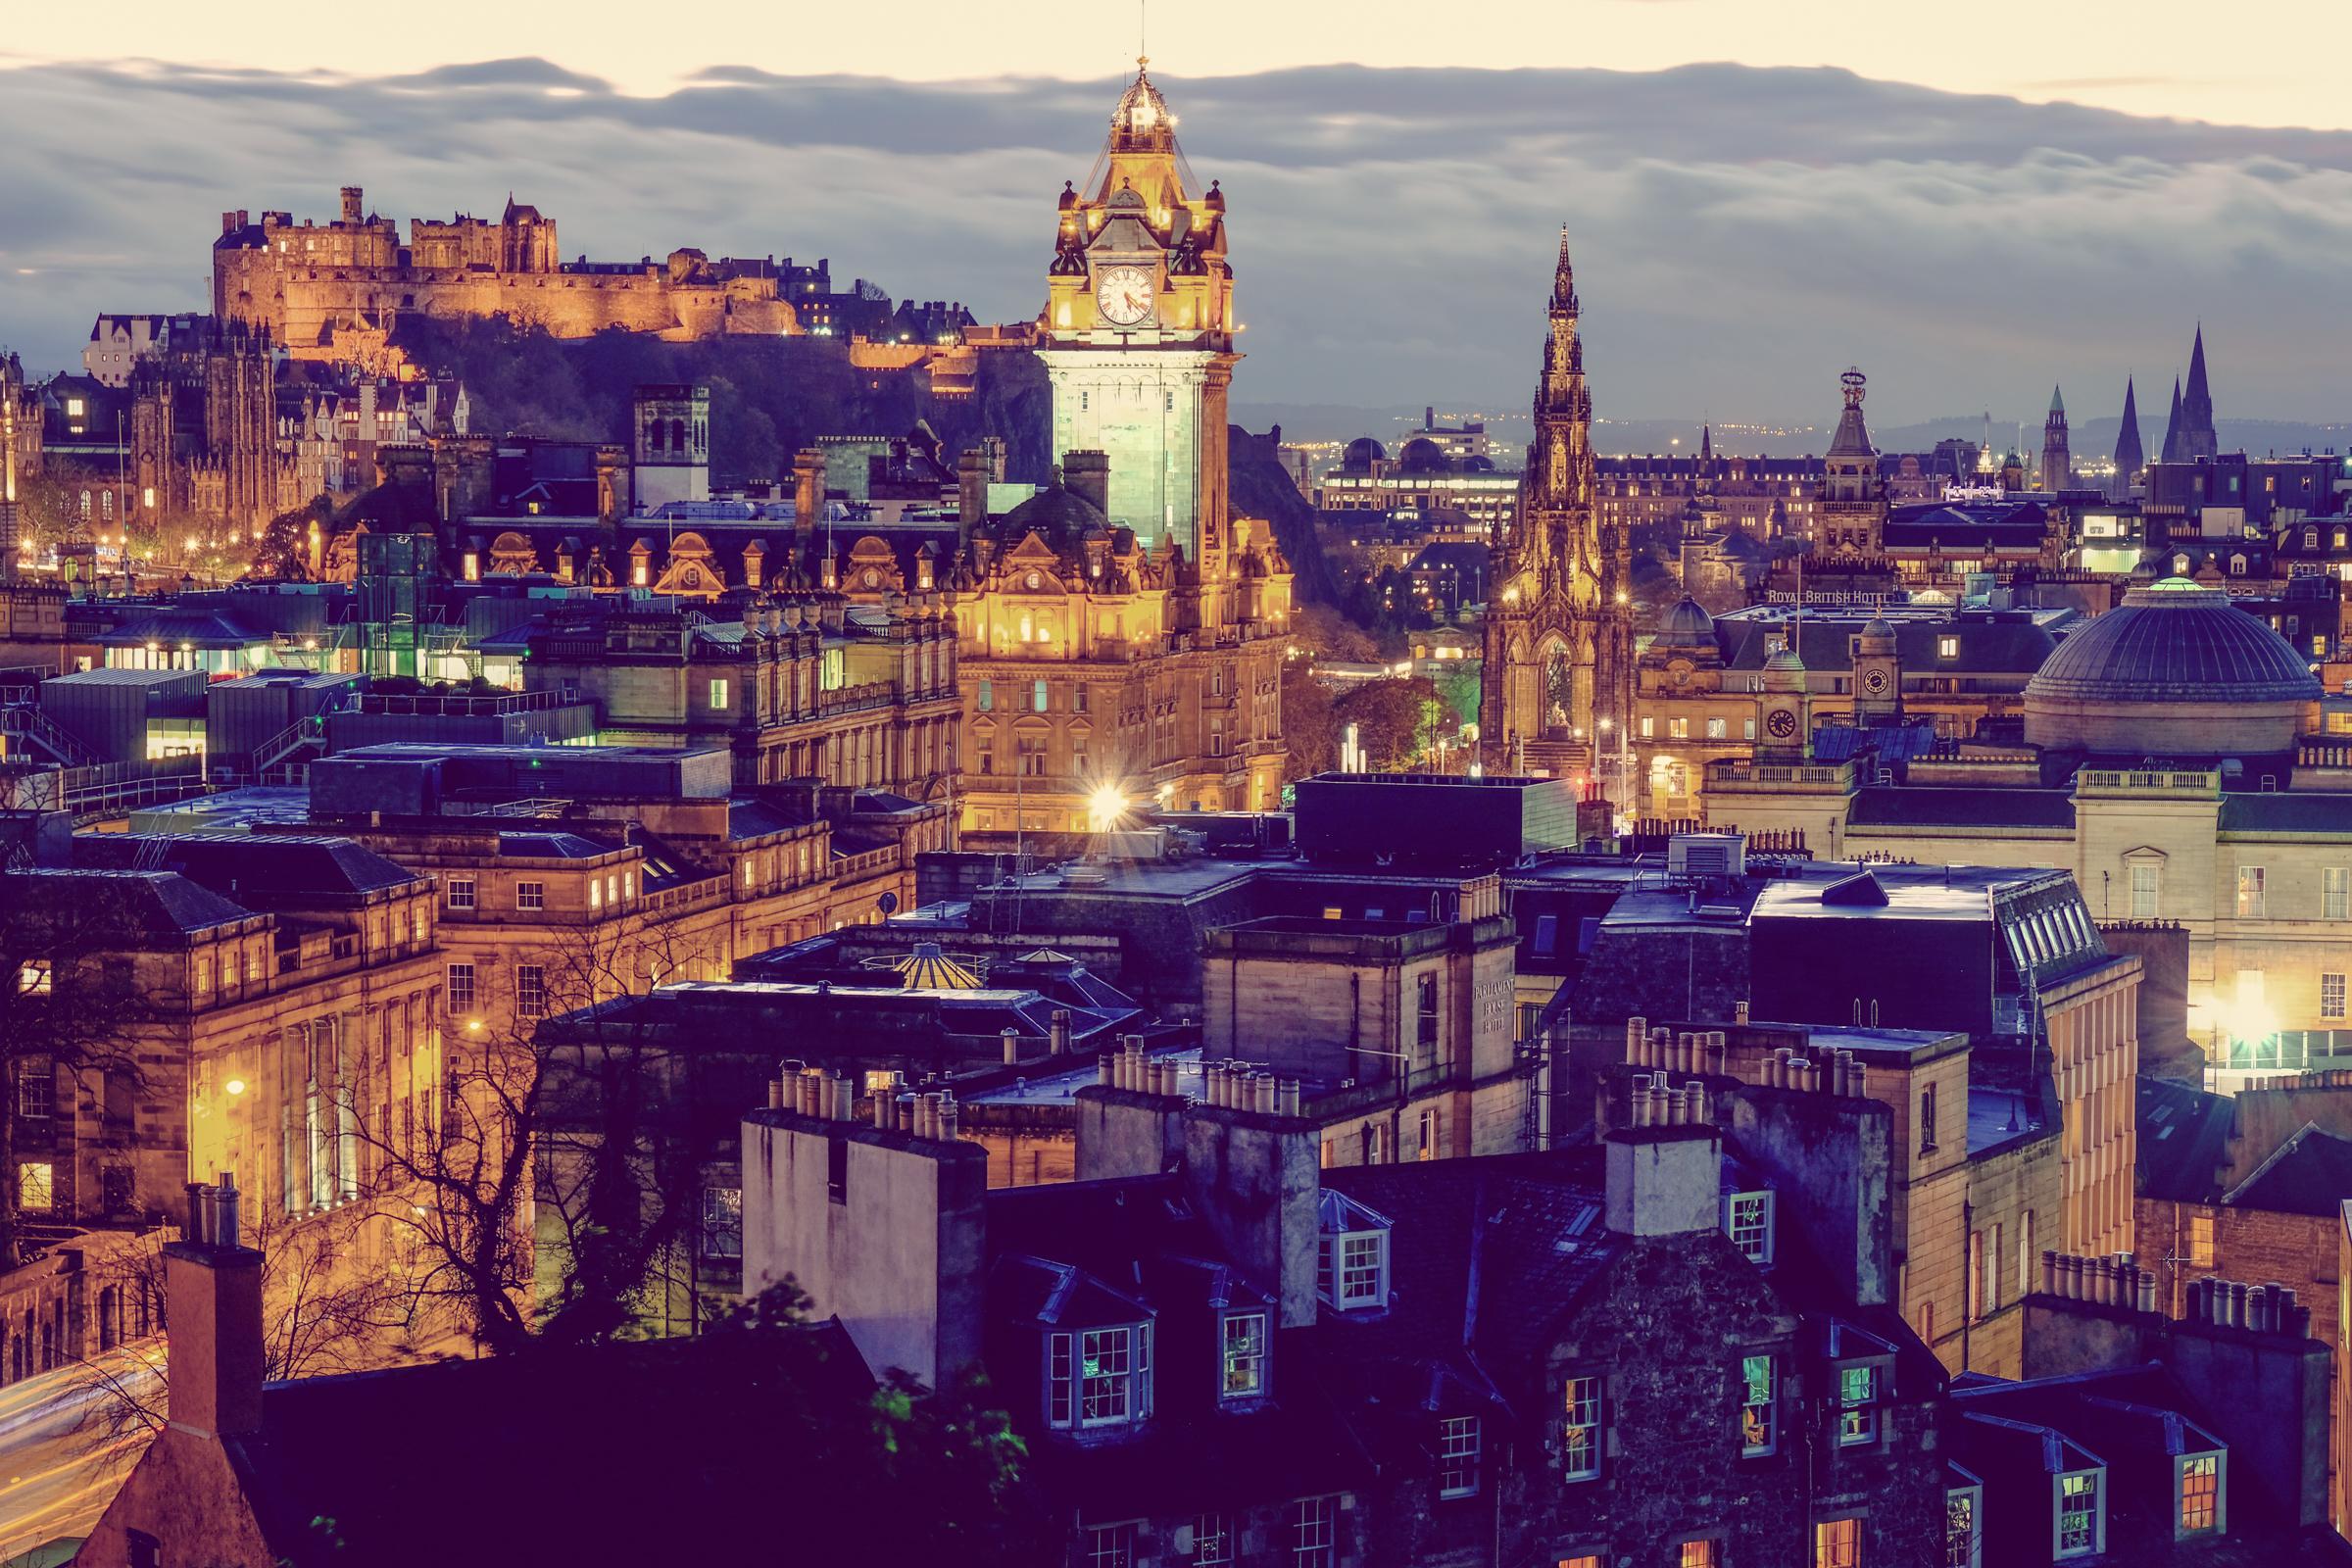 Scotlands capital city Edinburgh